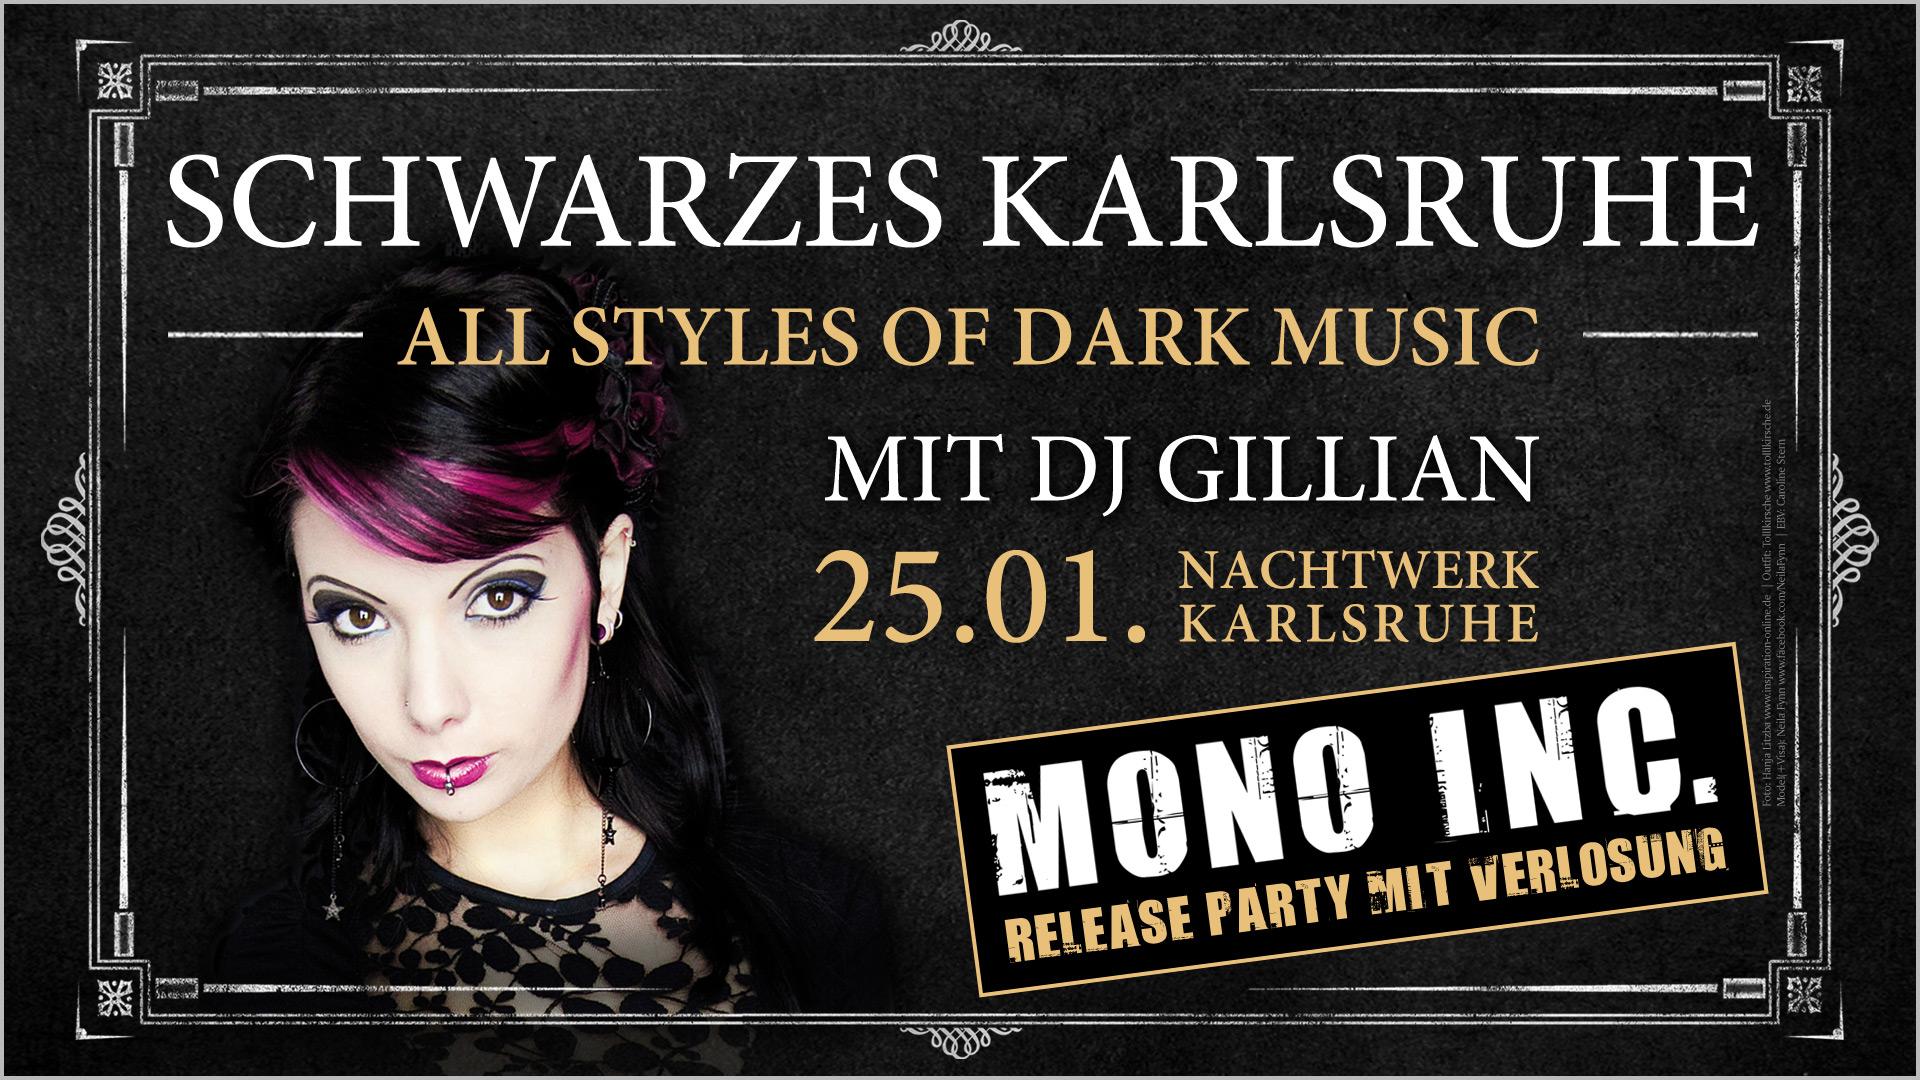 Schwarzes Karlsruhe & Mono Inc. Release Party